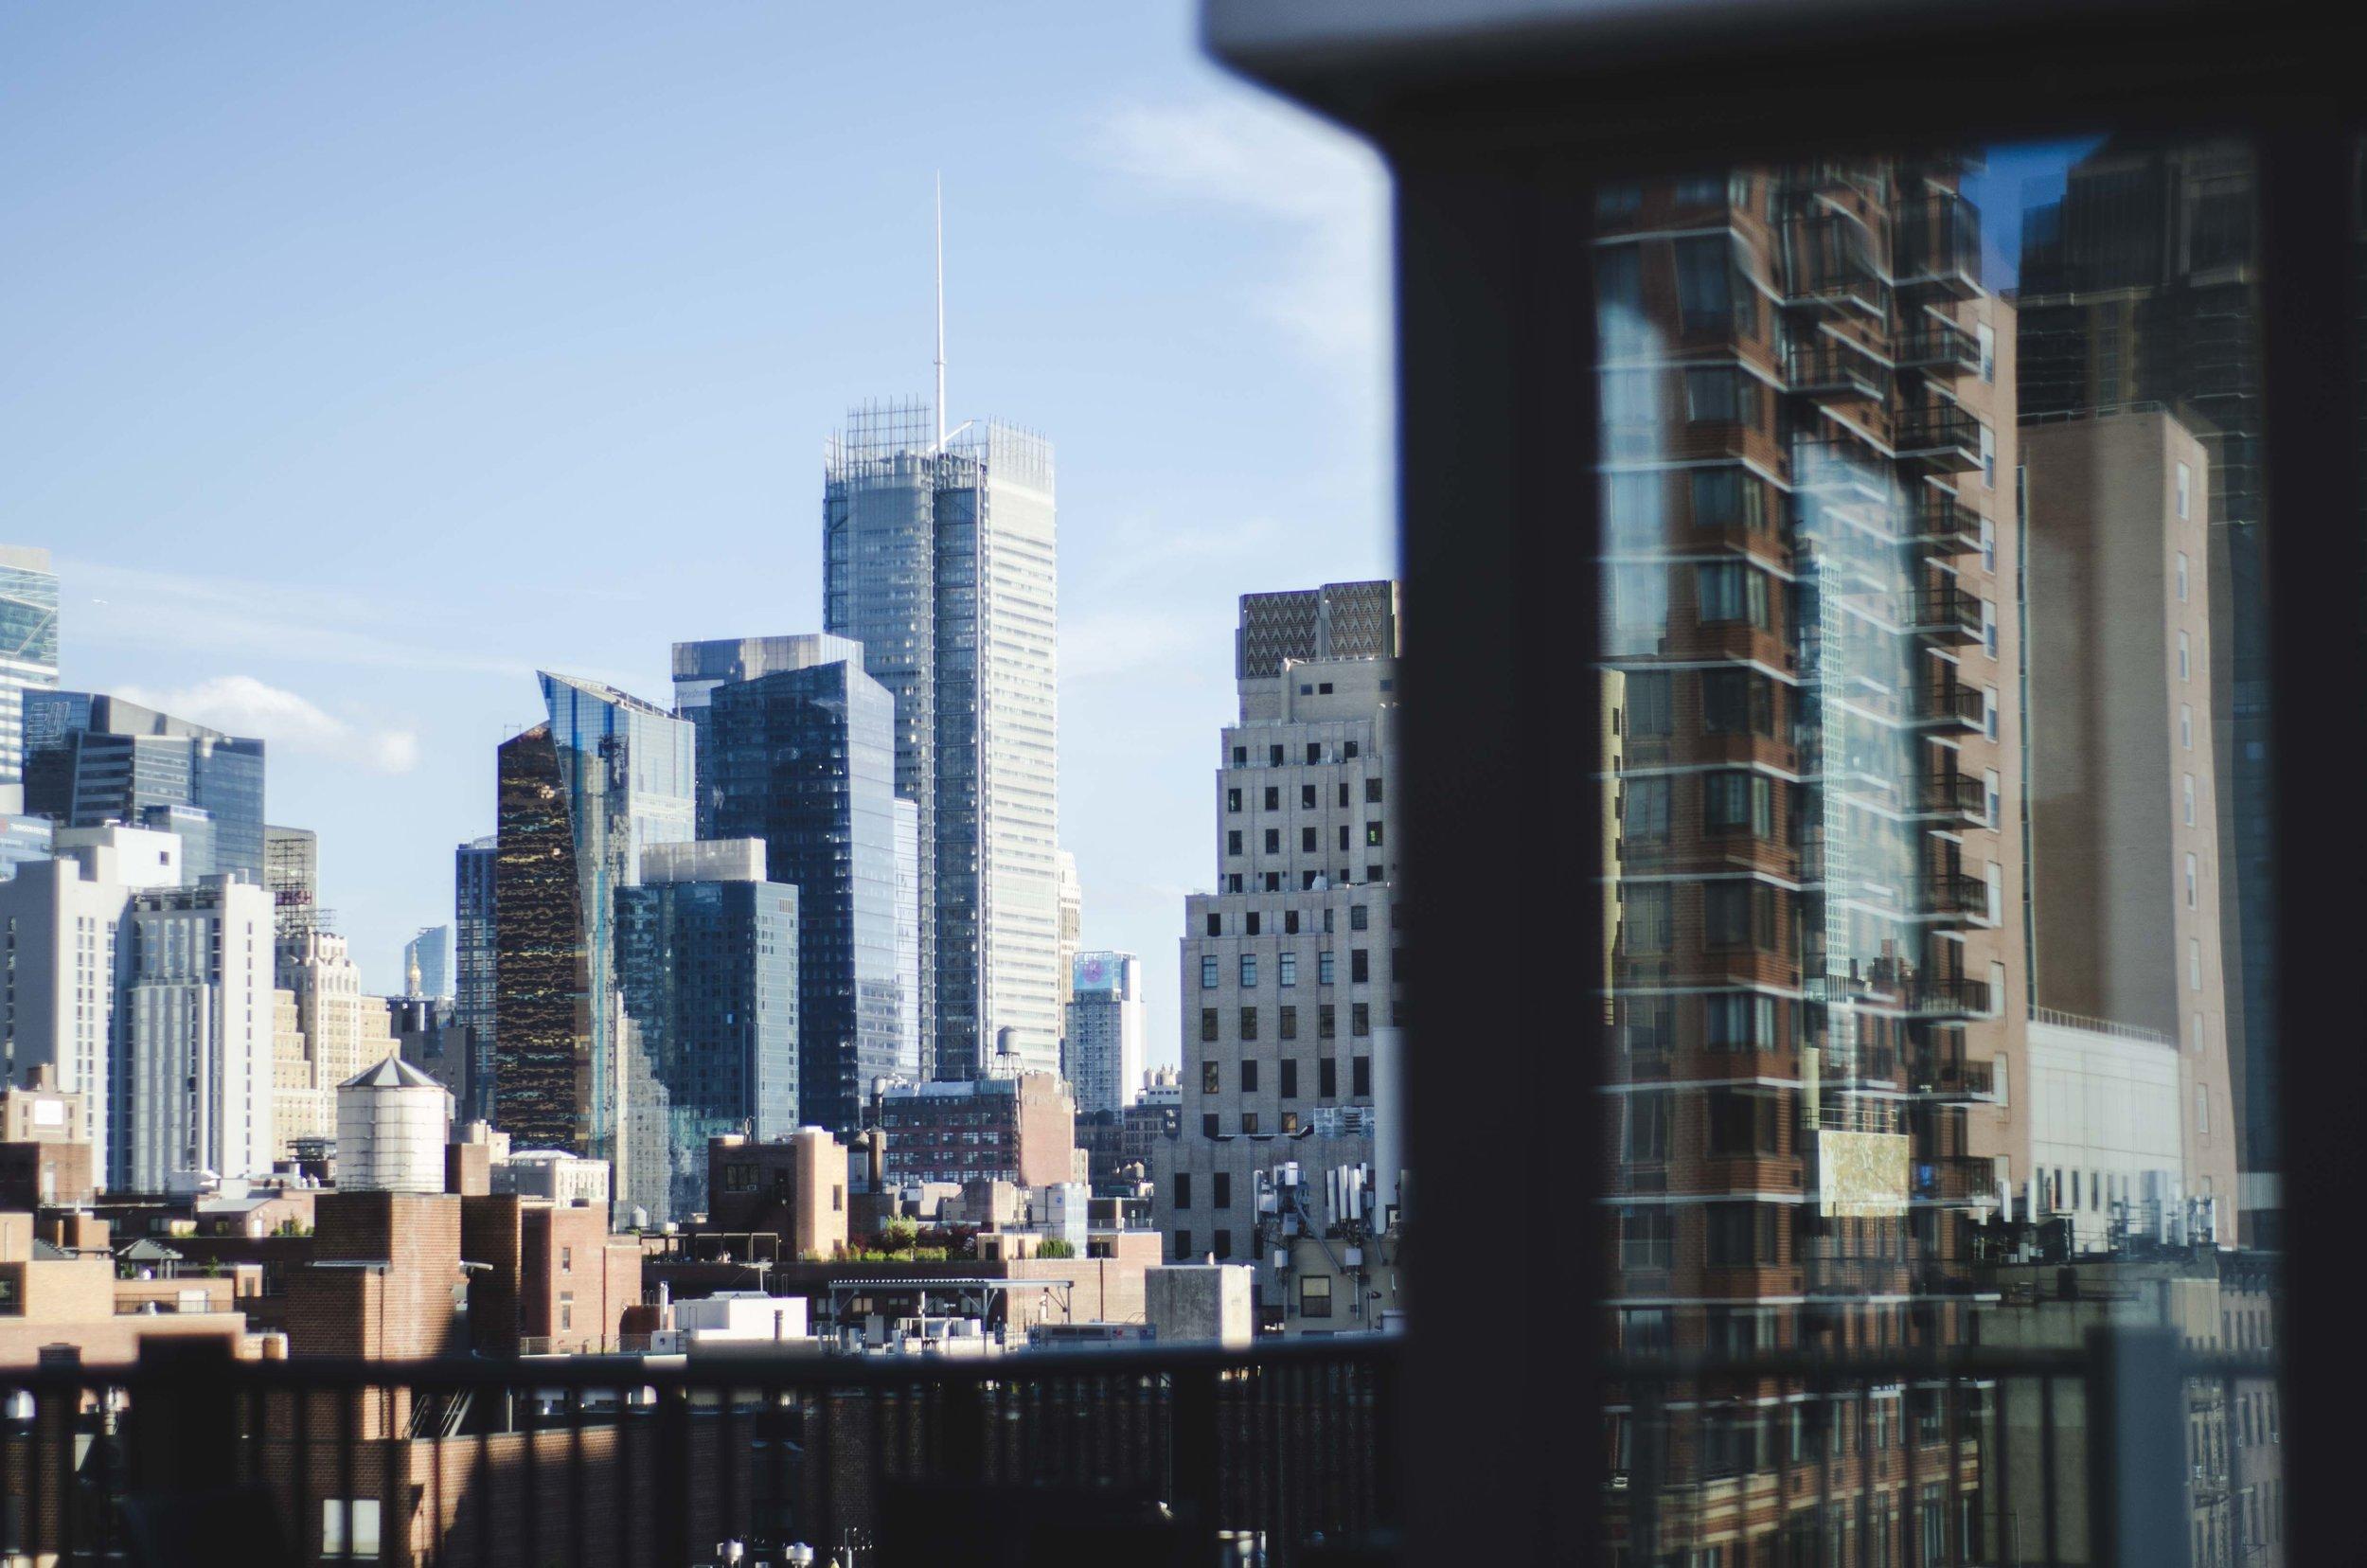 NYC_38.jpg